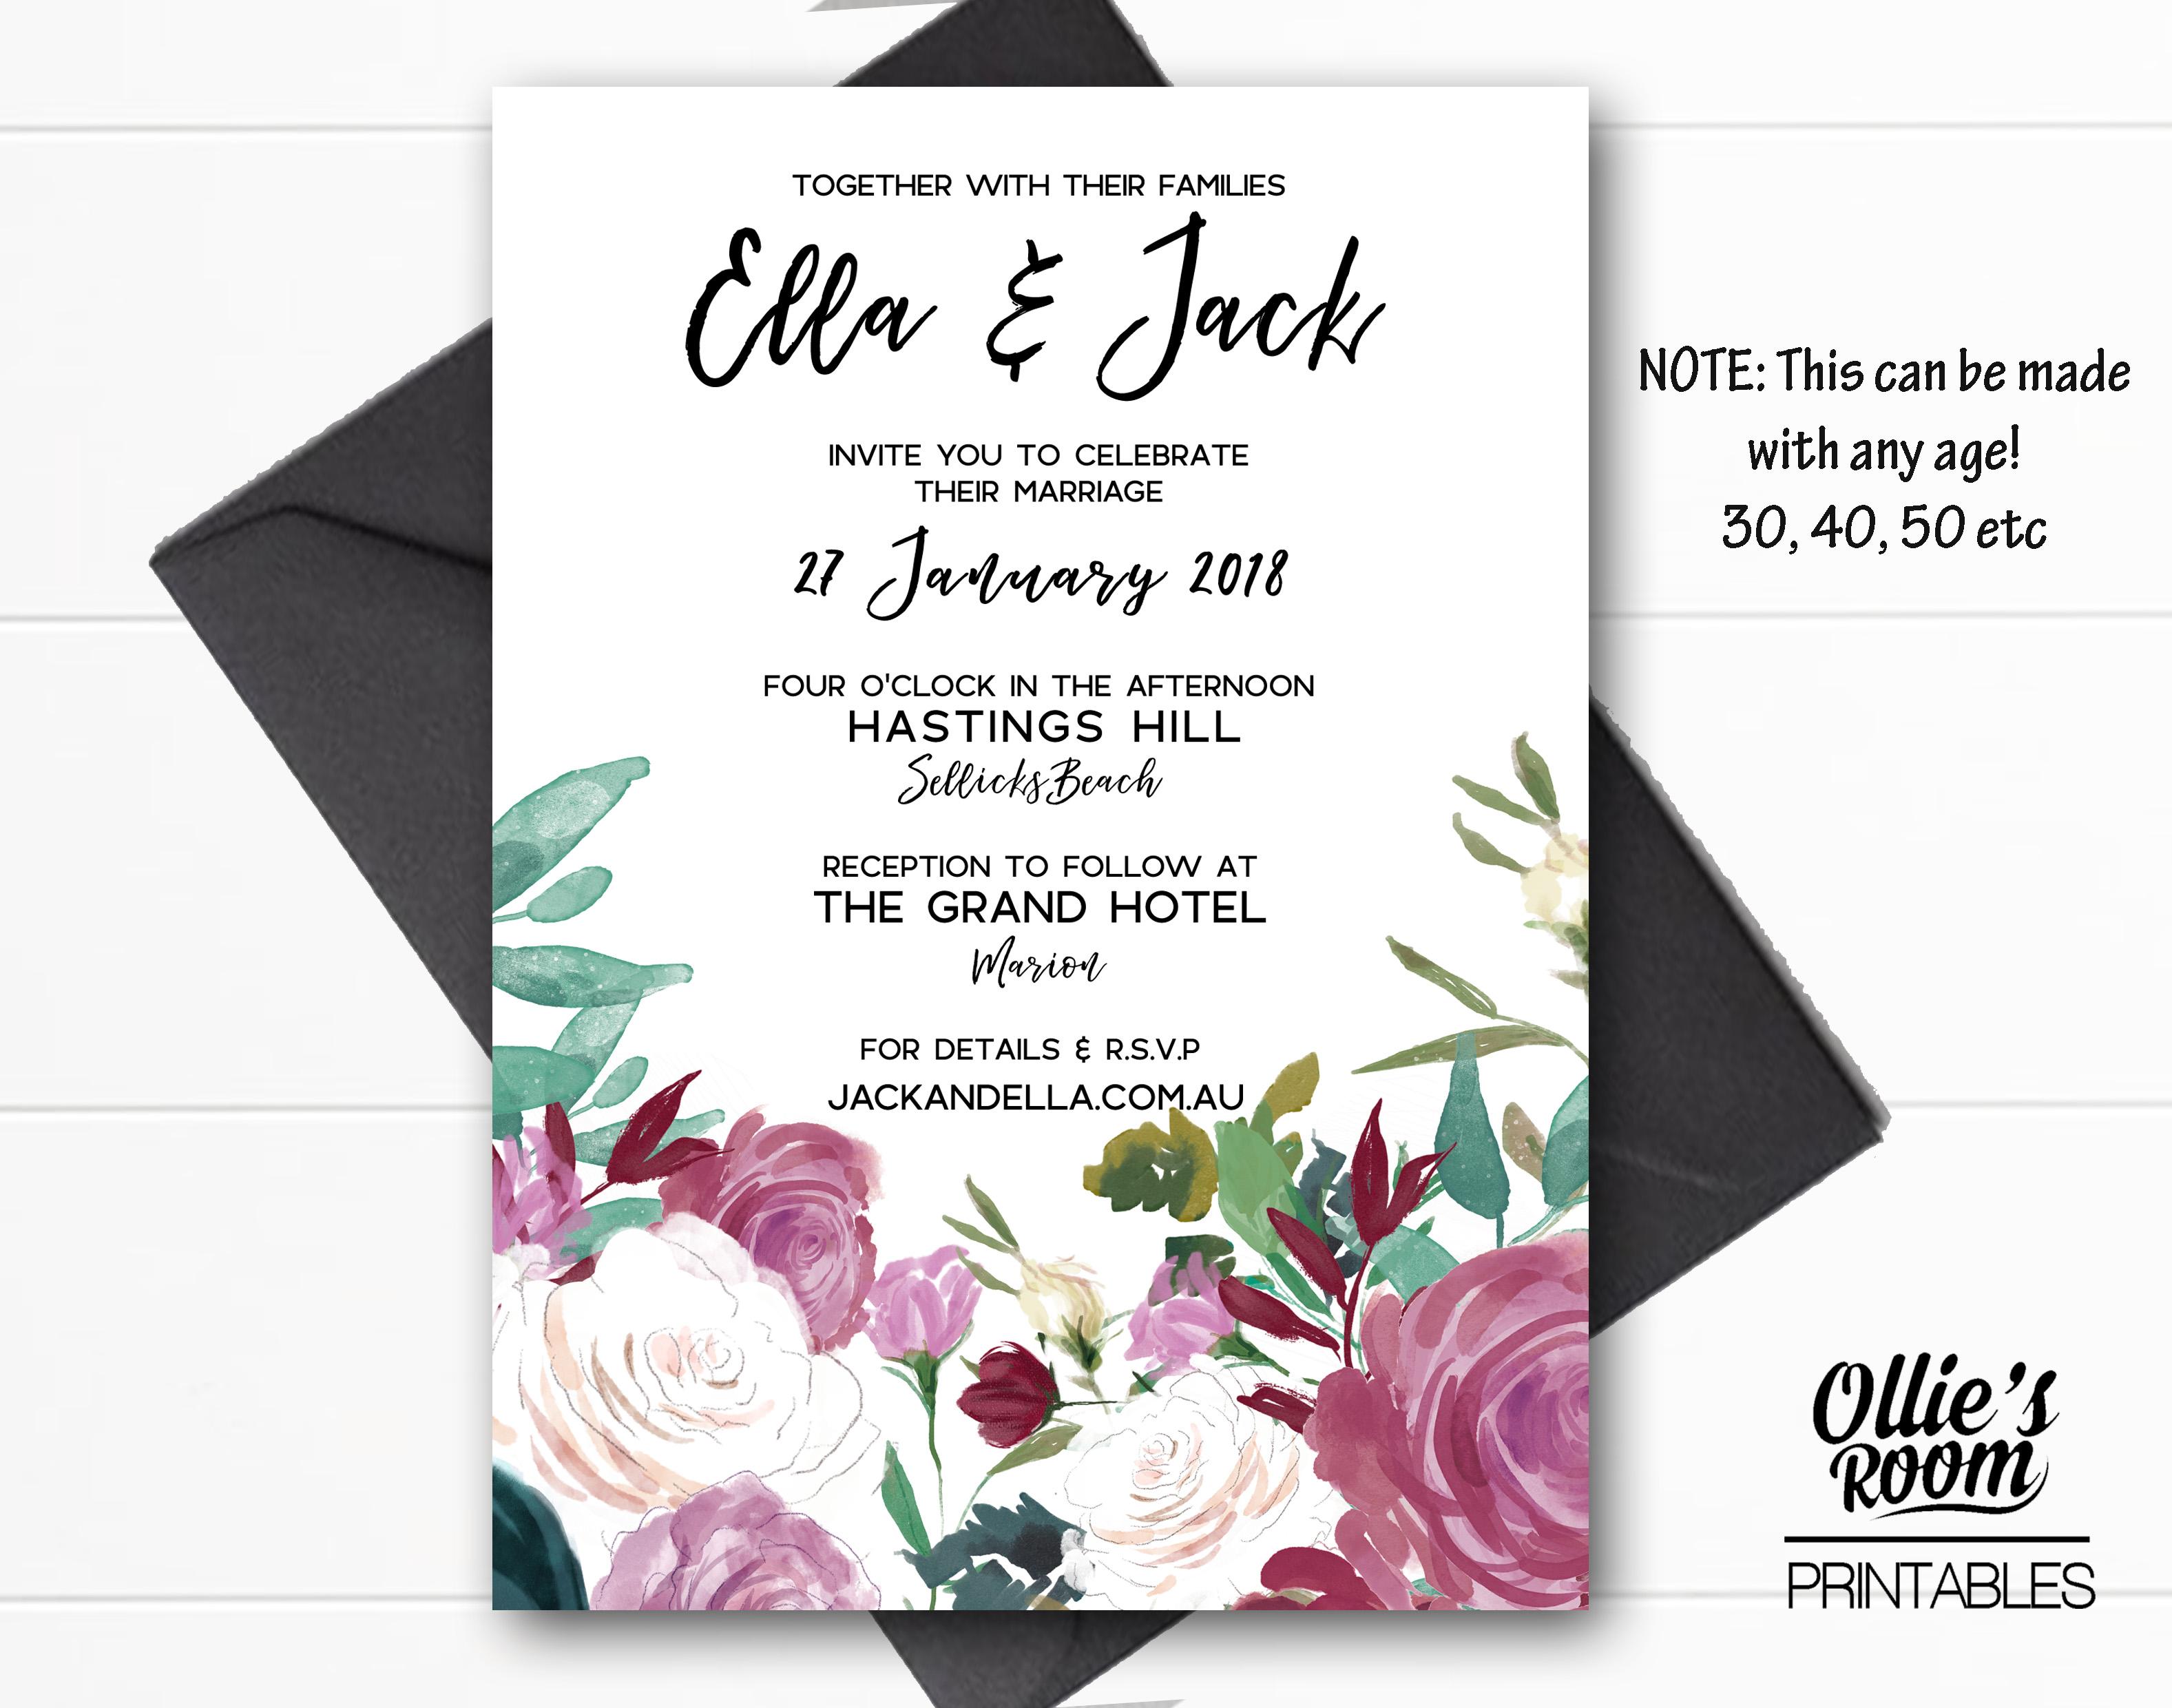 Floral Wedding Invitations.Peachy Floral Wedding Invitation Country Style Wedding Invitation